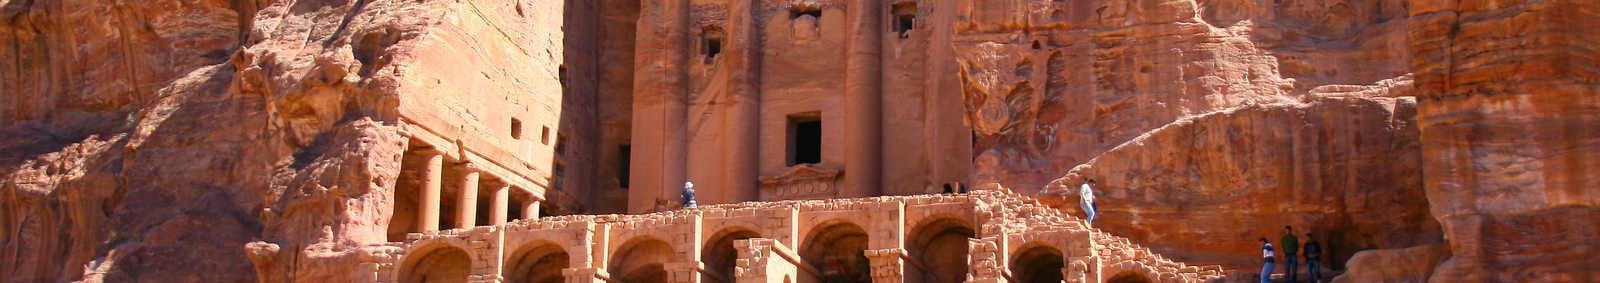 Remains of Nabatean civilisation, Jordan